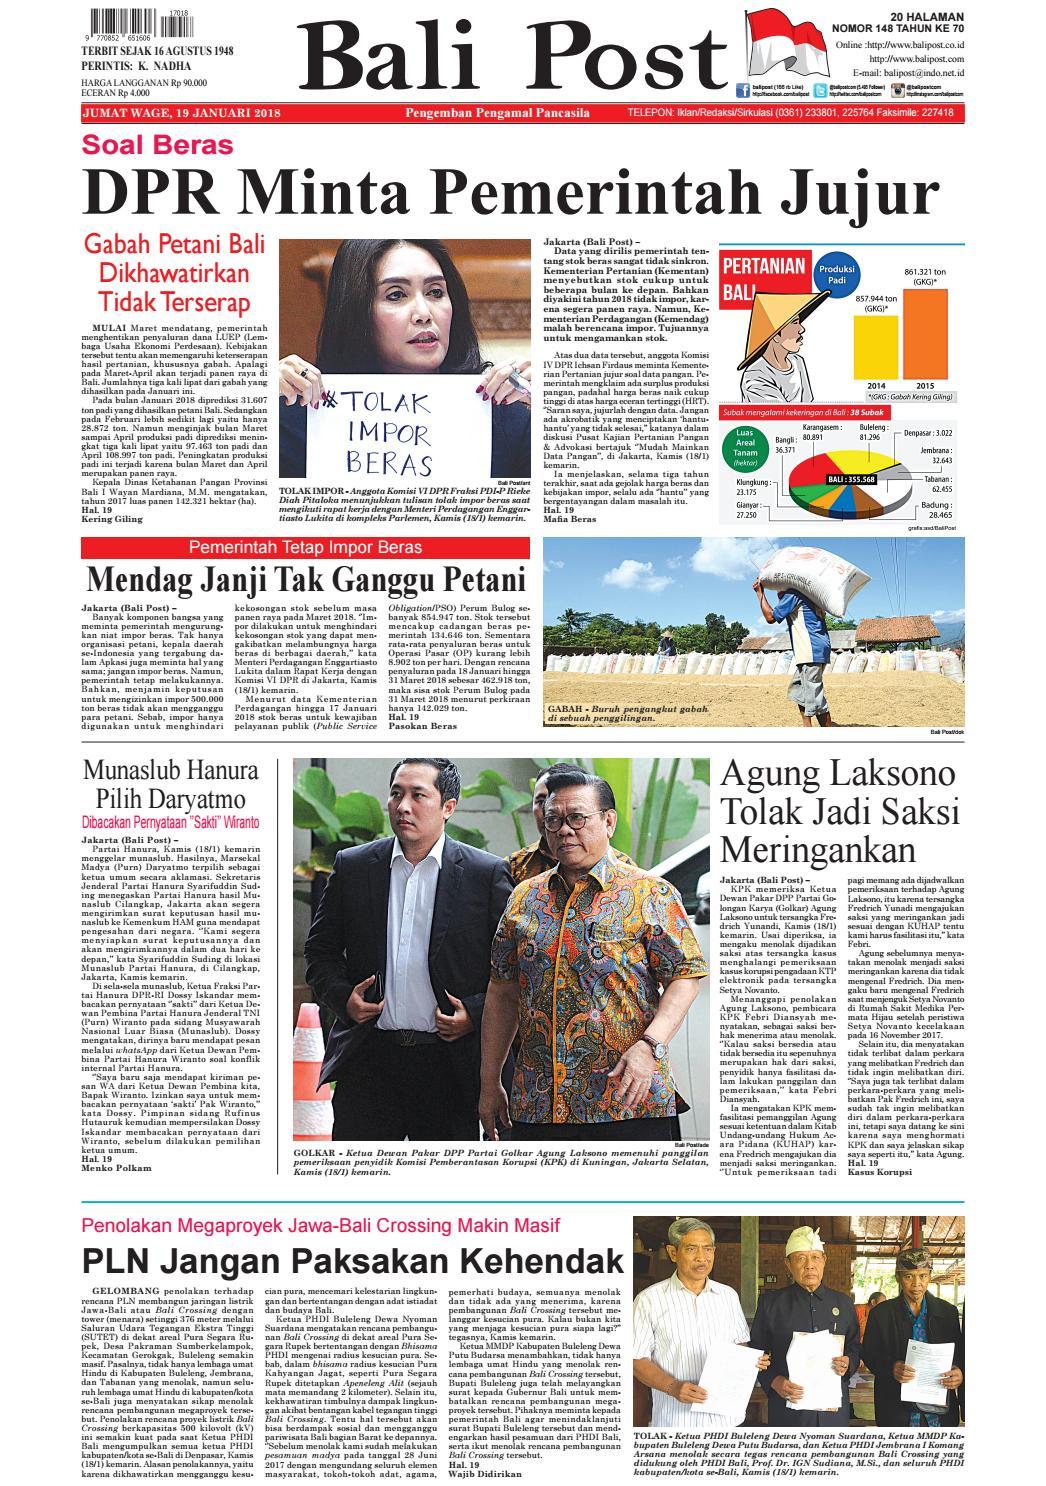 Edisi 19 Januari 2018 Balipost Com By E Paper Kmb Issuu